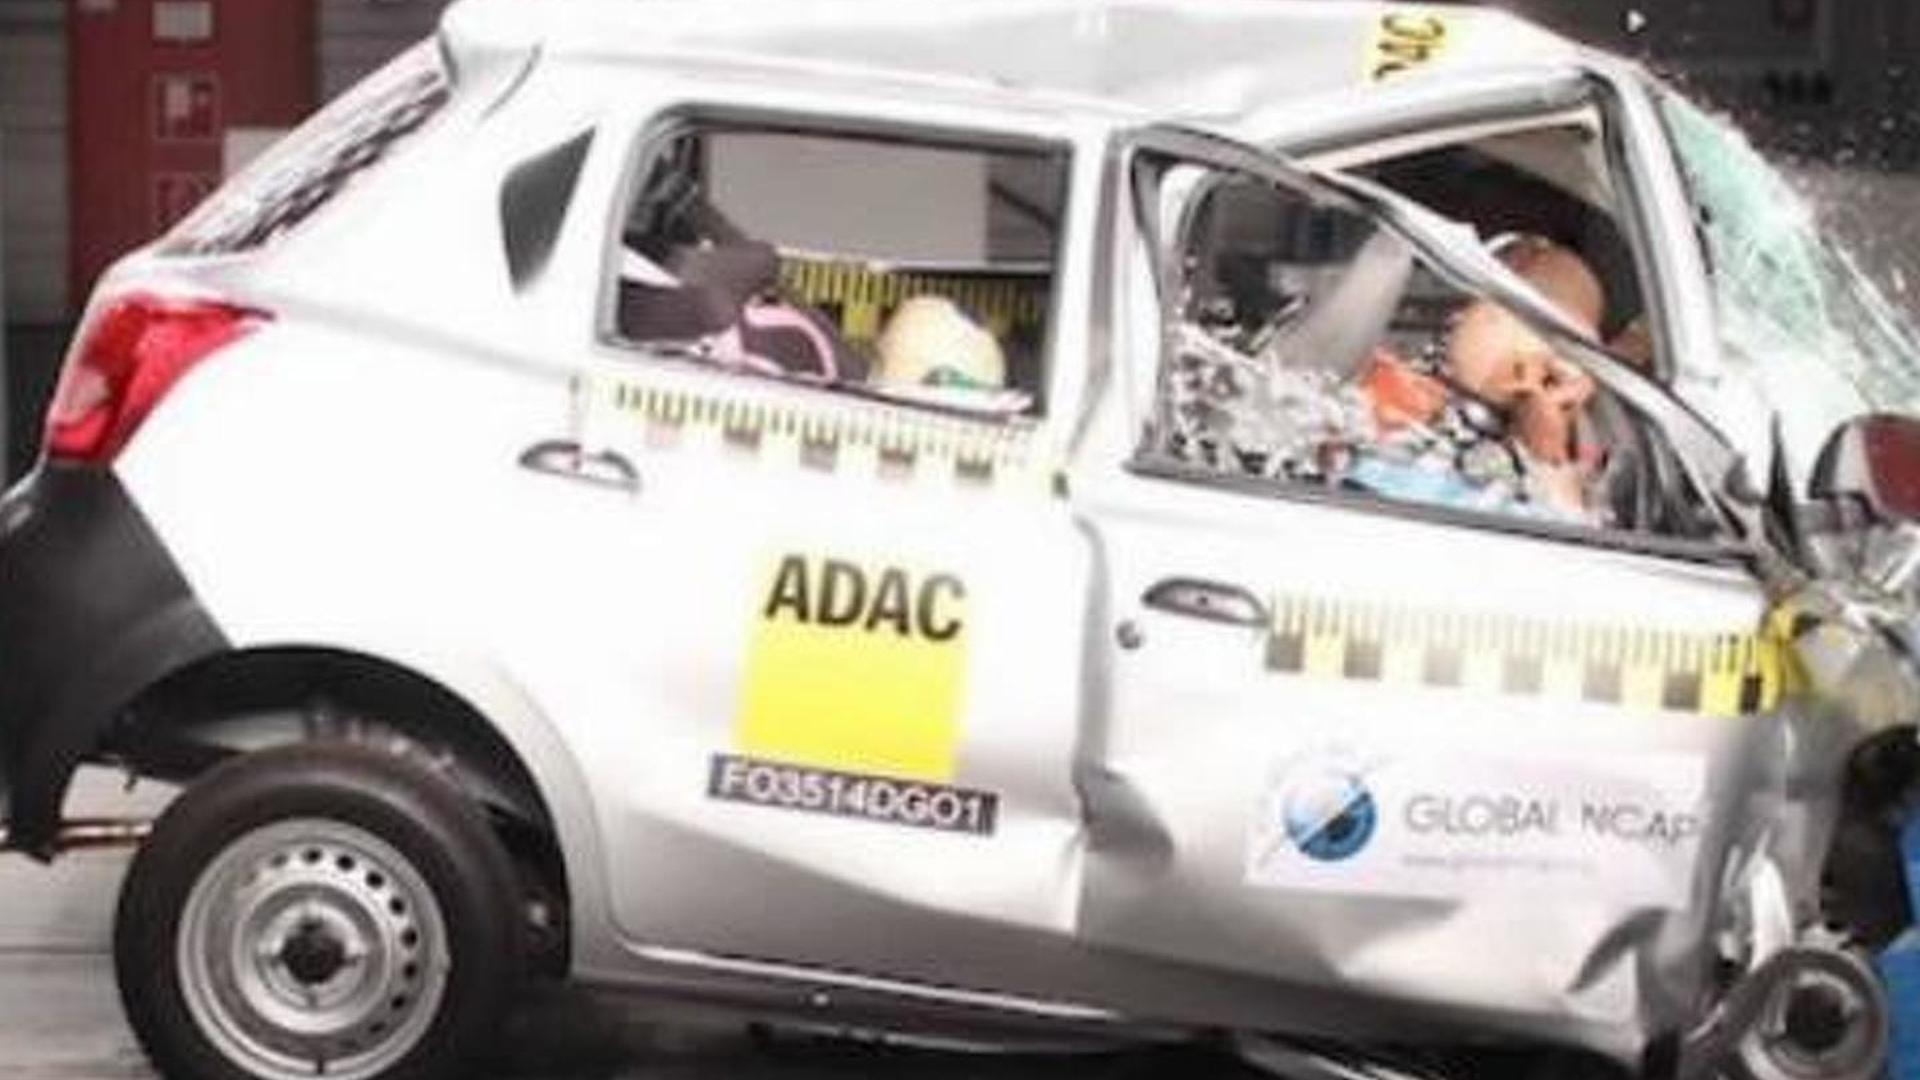 Datsun Go and Maruti Suzuki Swift get shameful zero star rating in Bharat NCAP crash test